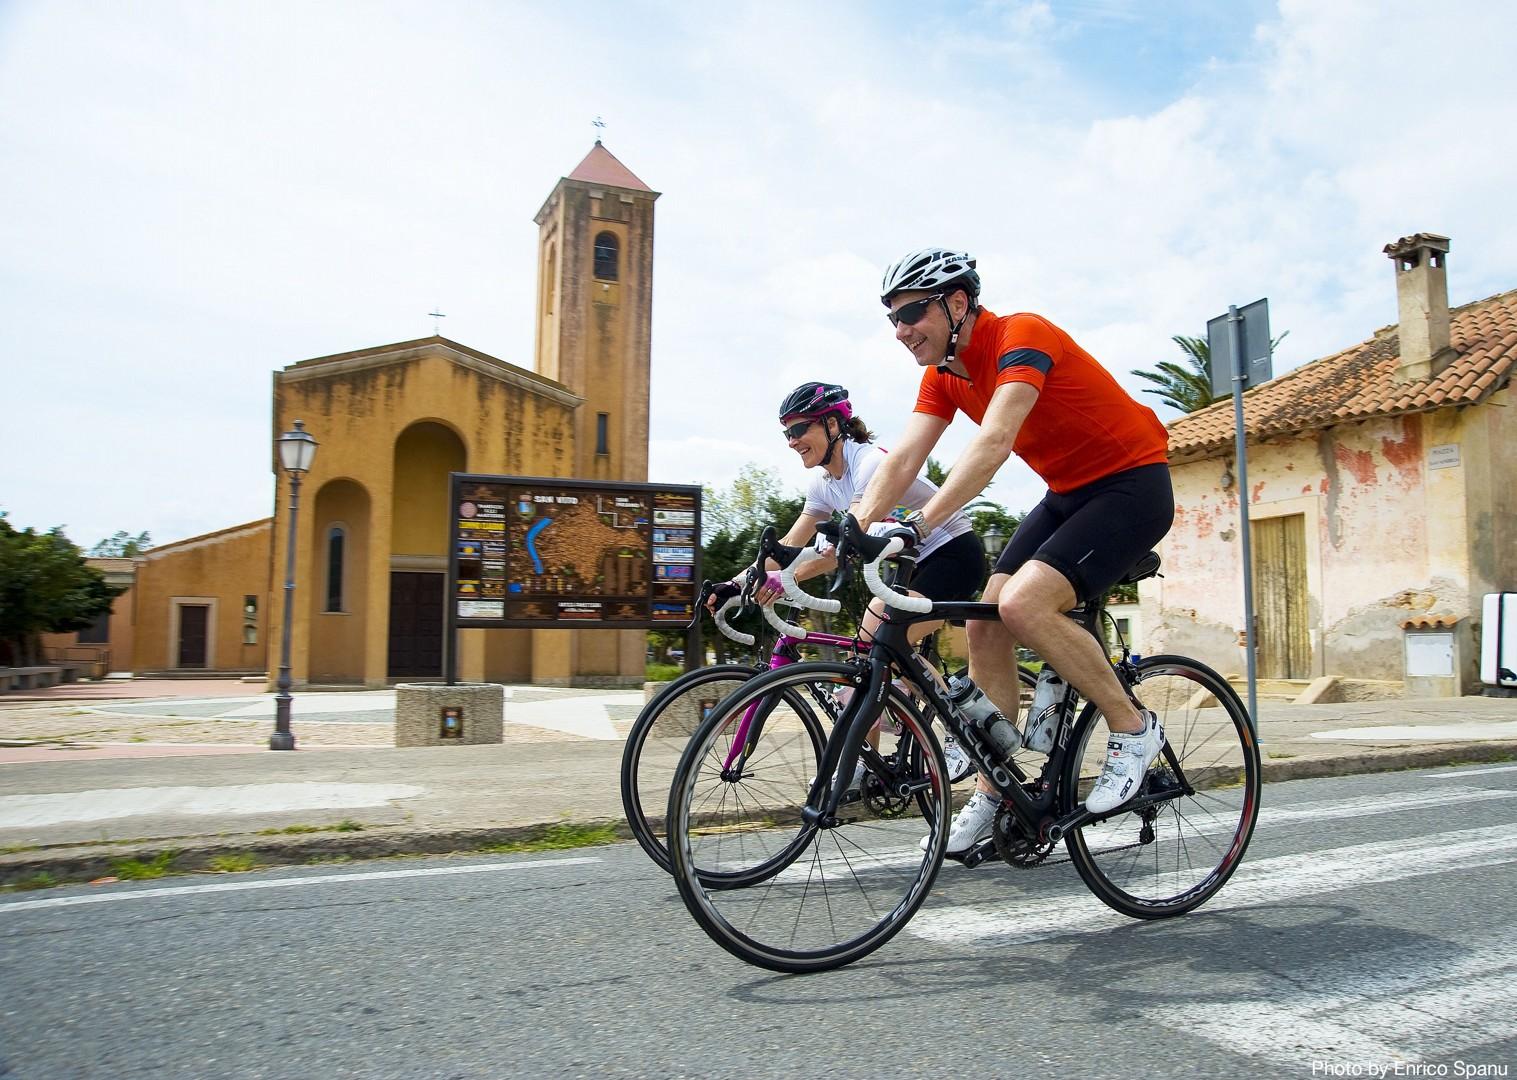 Sardinia-Sardinian-Mountains-Guided-Road-Cycling-Holiday.jpg - Italy - Sardinia - Mountain Explorer - Guided Road Cycling Holiday - Italia Road Cycling